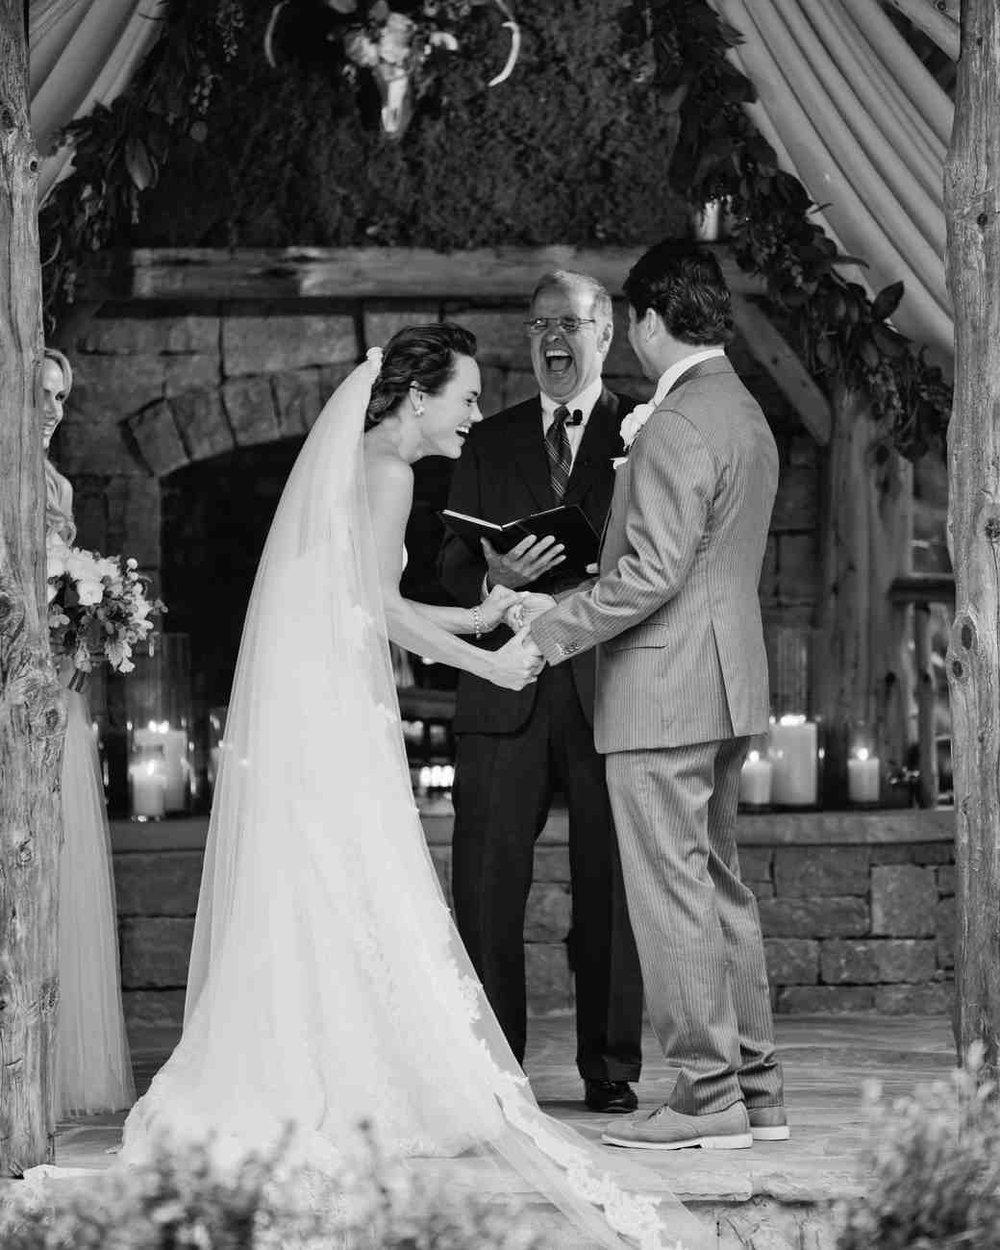 memree-rich-wedding-ceremony-422-6257086-0217_vert.jpg